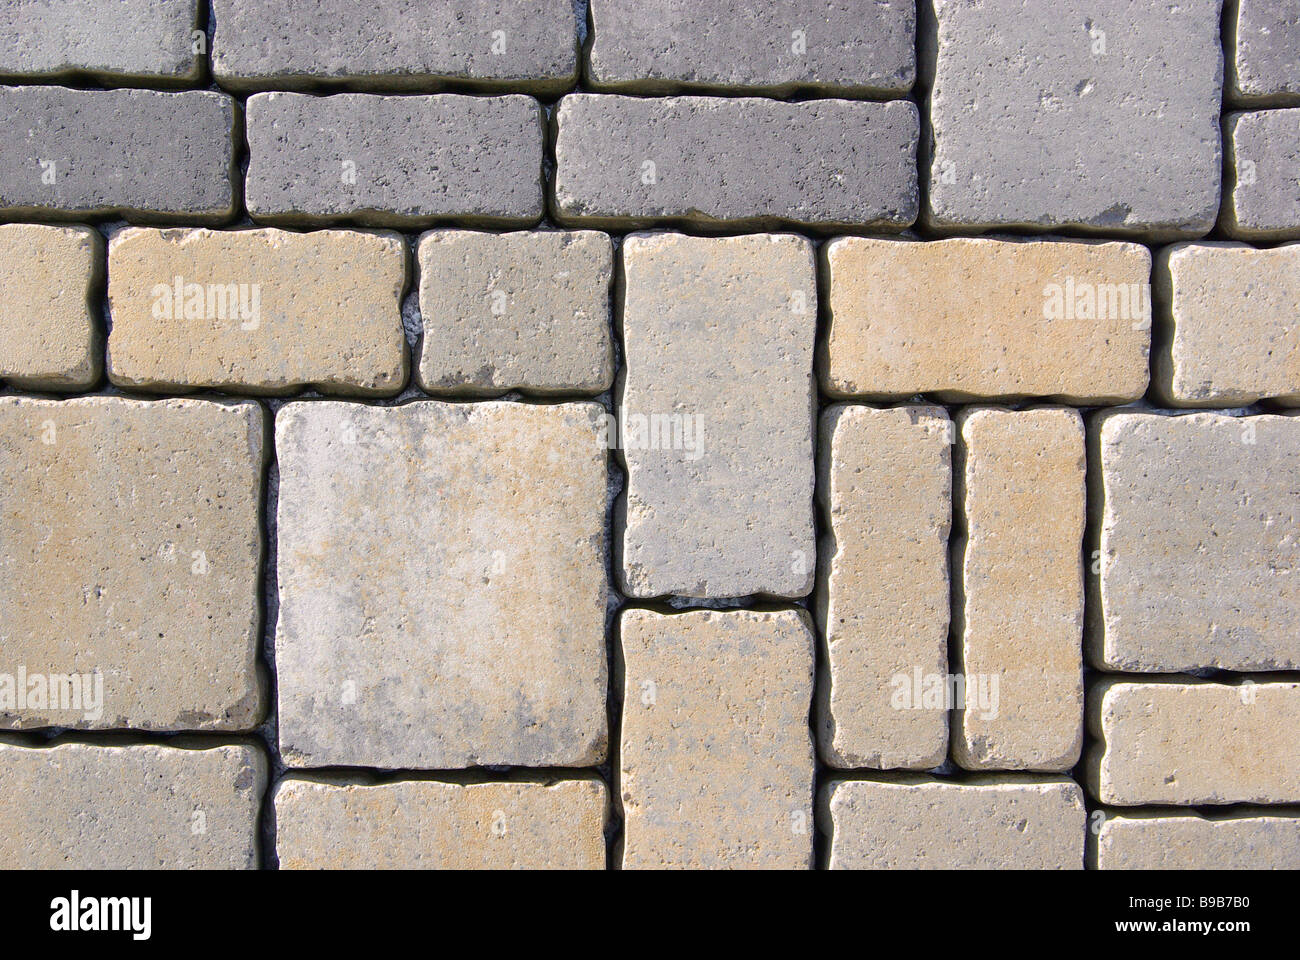 Pflasterstein cobblestone 03 - Stock Image